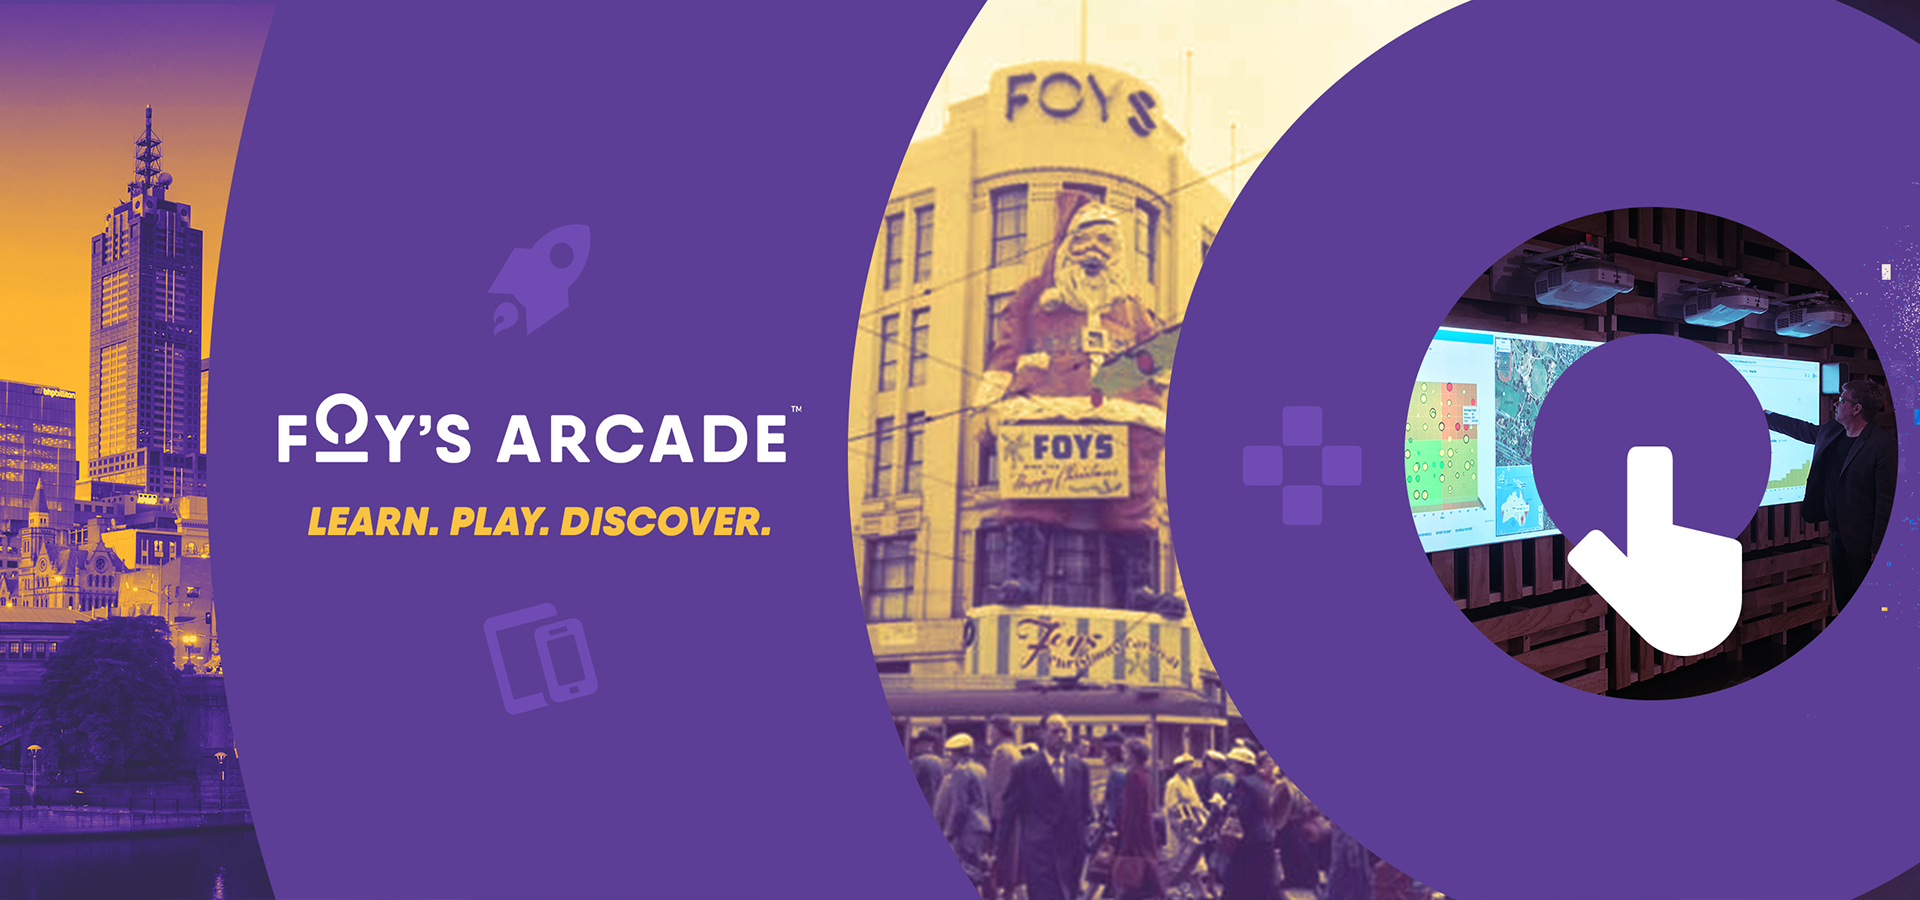 Foy's Arcade